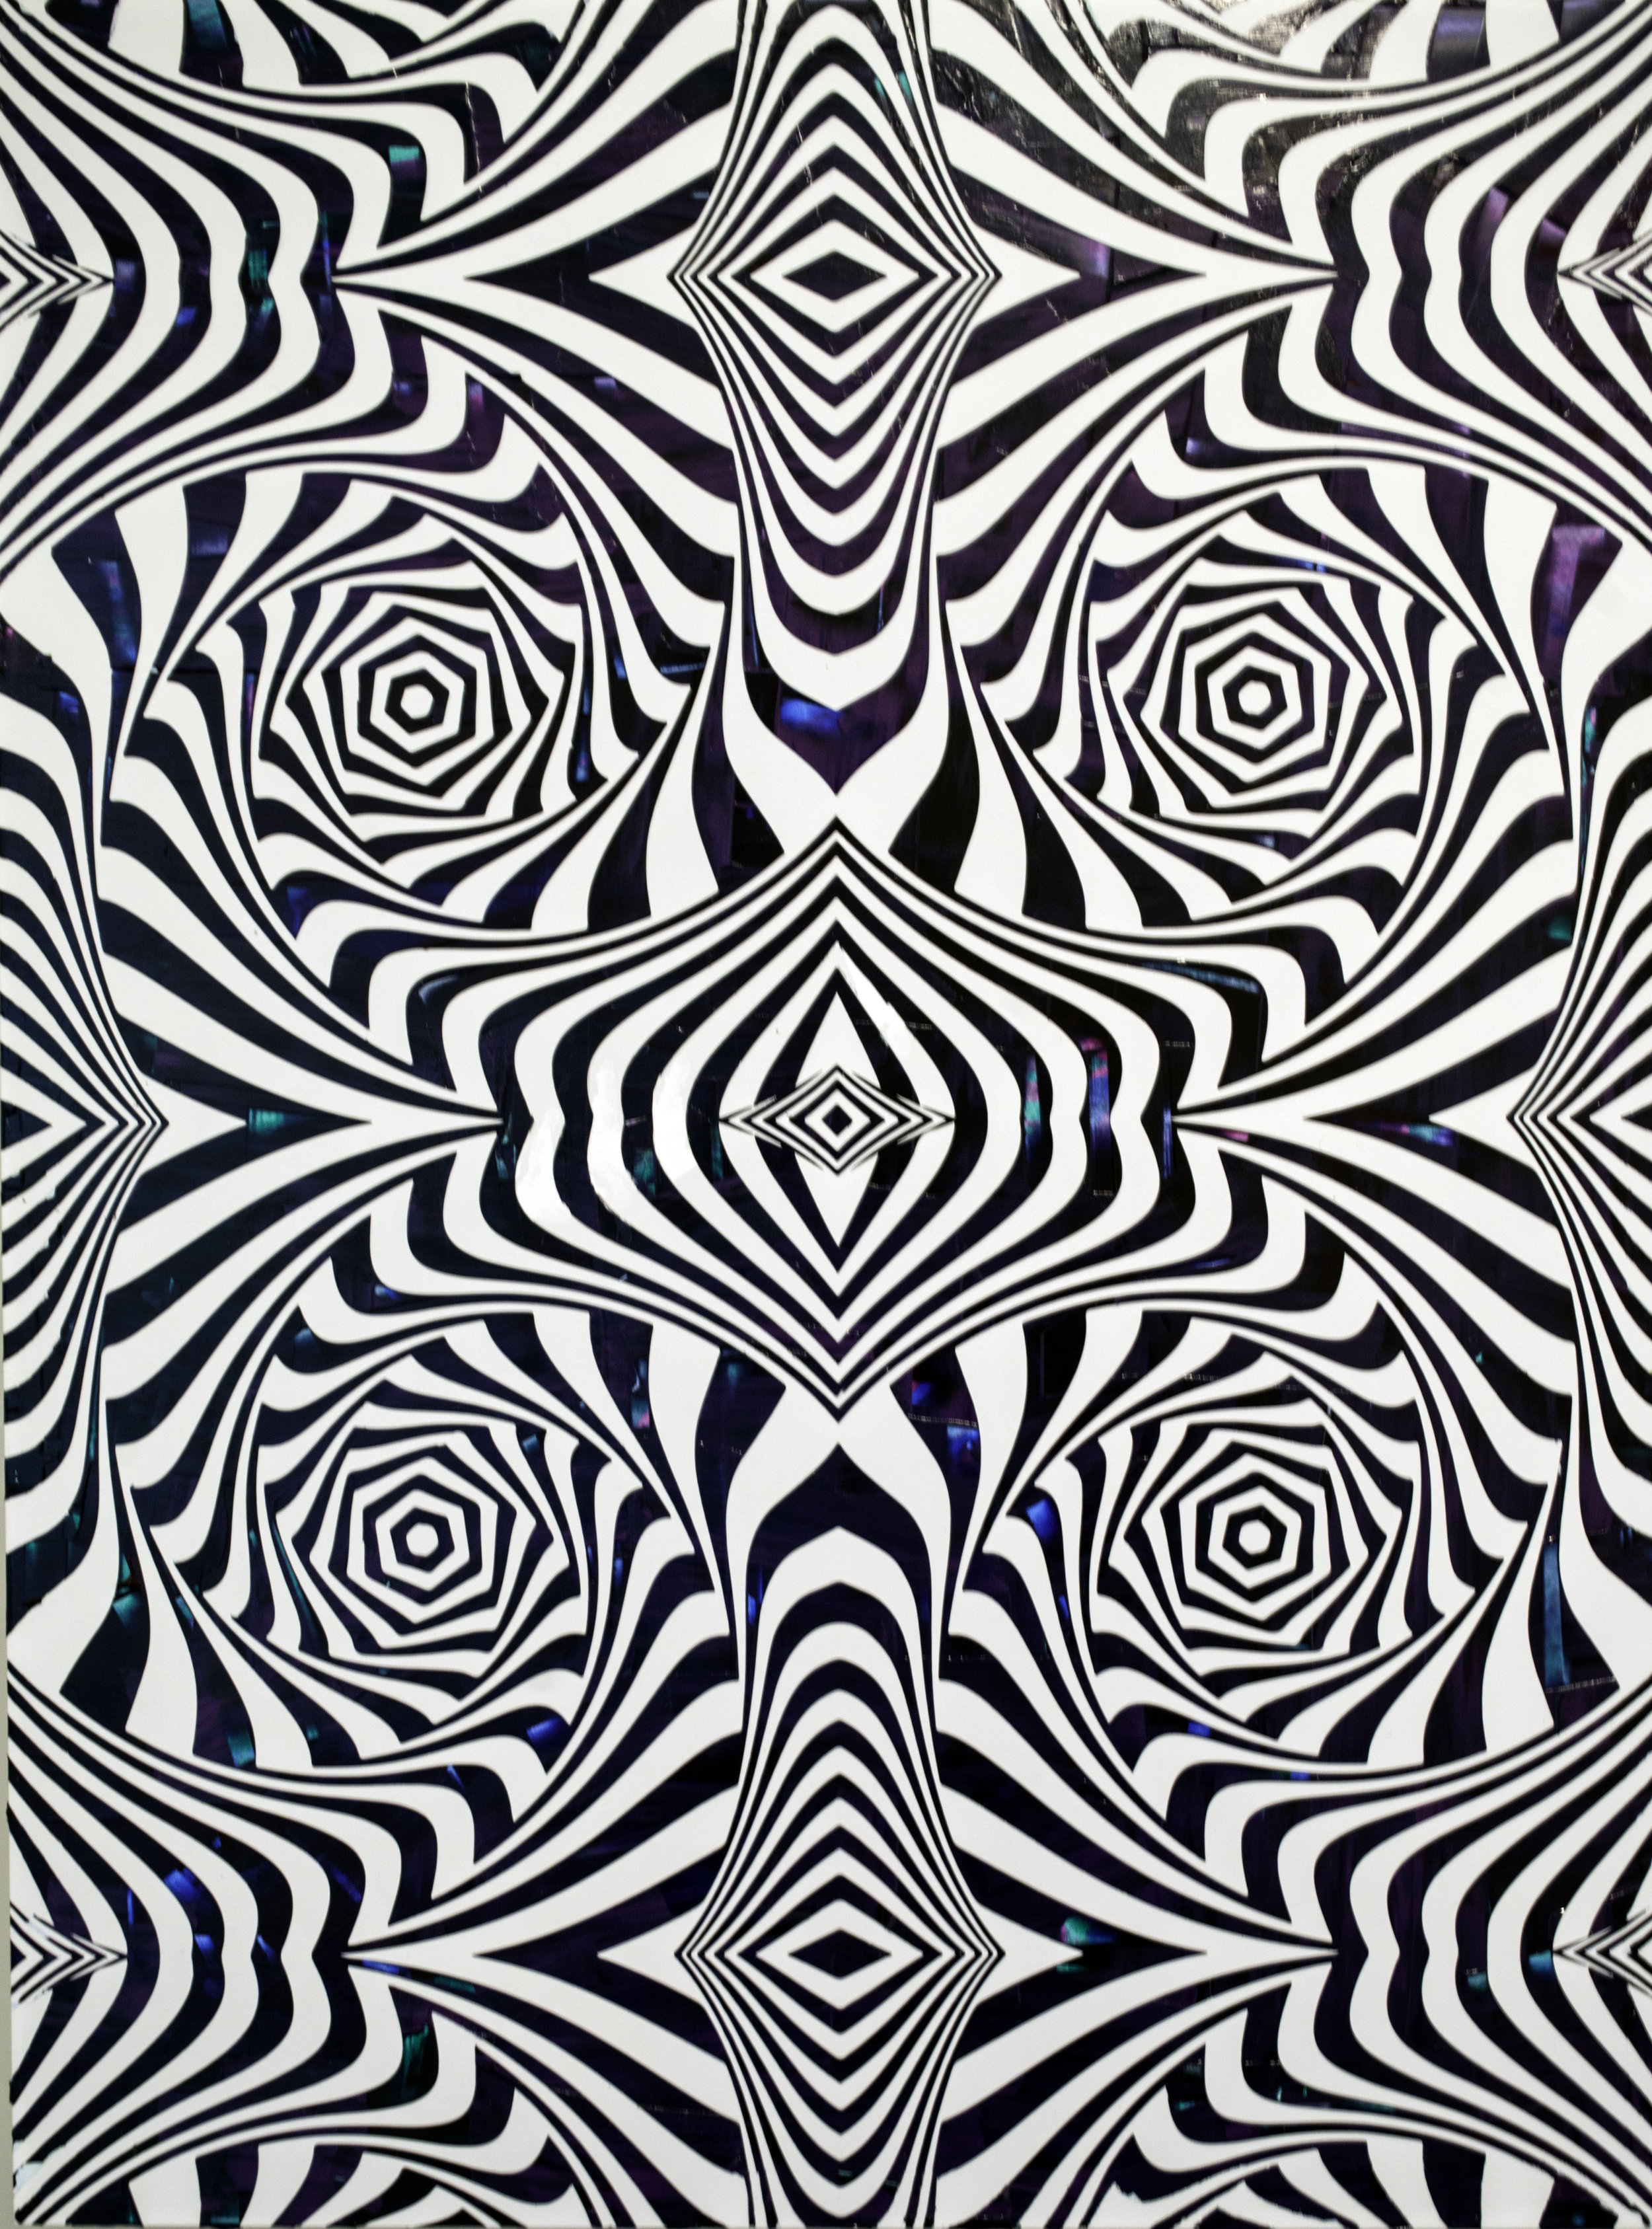 HUE Gallery of Contemporary Art - Sean Christopher Ward - Hallucinogen - Acrylic on Wood Panel - 18x24x1.5 - 2019 - $850.jpg